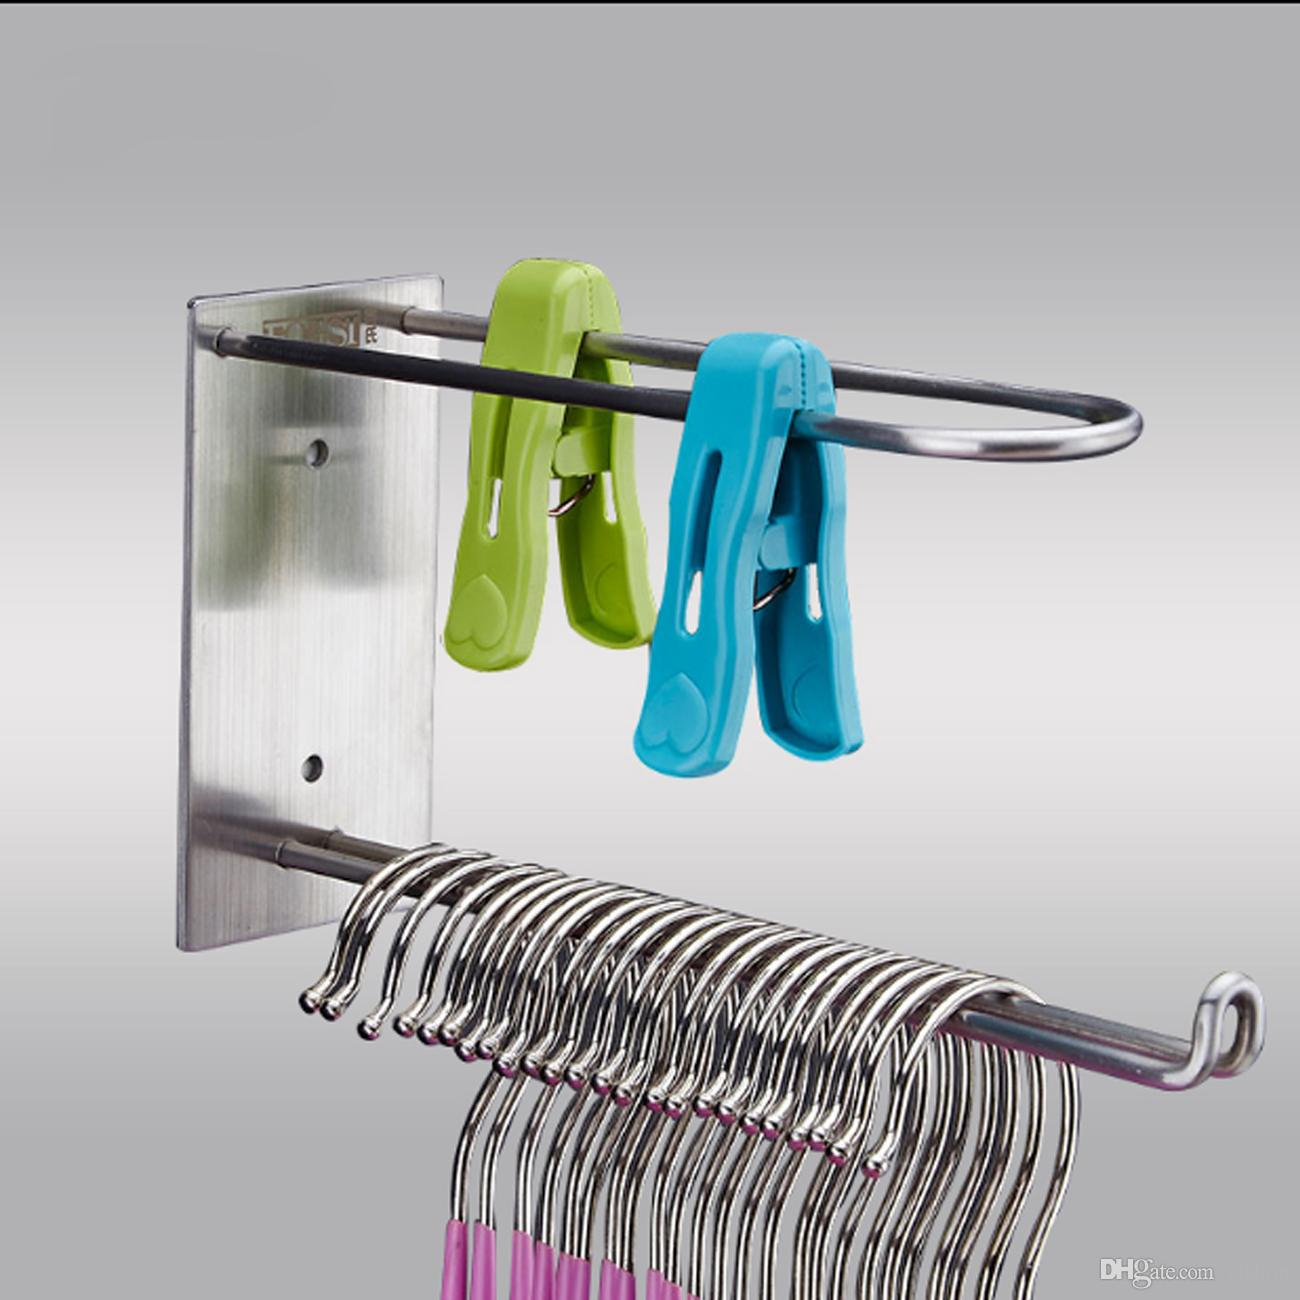 10 x Kitchen Bathroom Door Self Adhesive Wall Hanger Sticky Holder Hook Rack